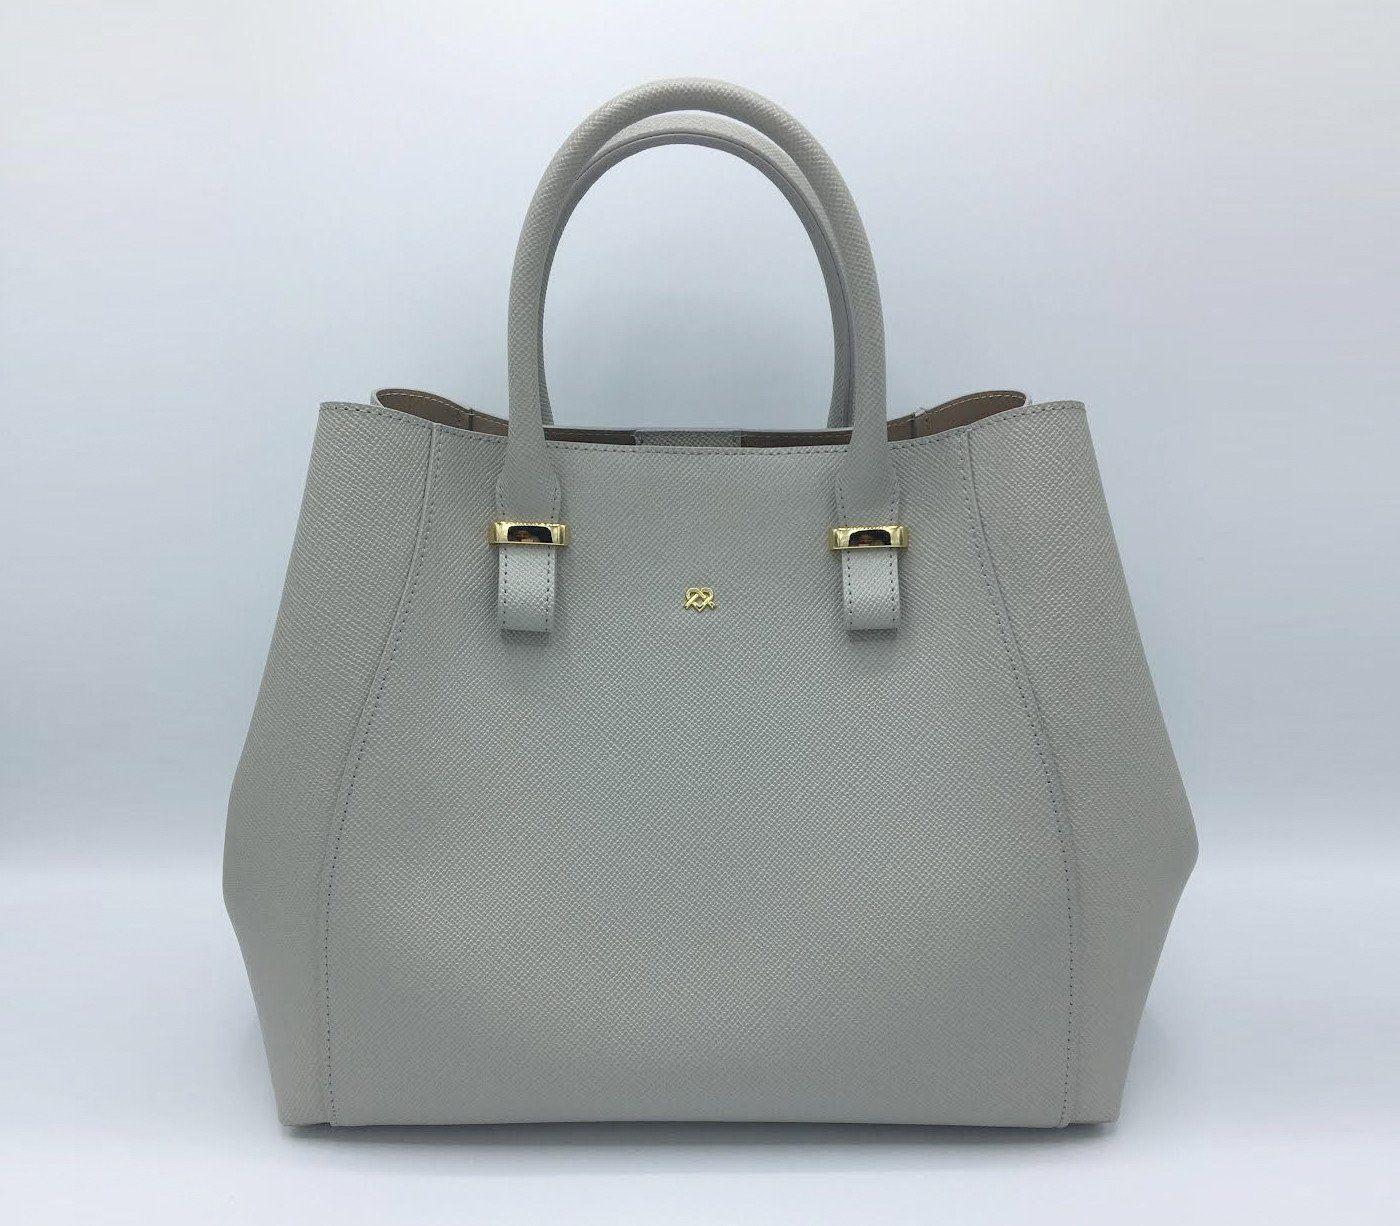 Jane Satchel By Gunas New York Vegan Leather Bag Vegan Leather Handbag Satchel Tote Bag